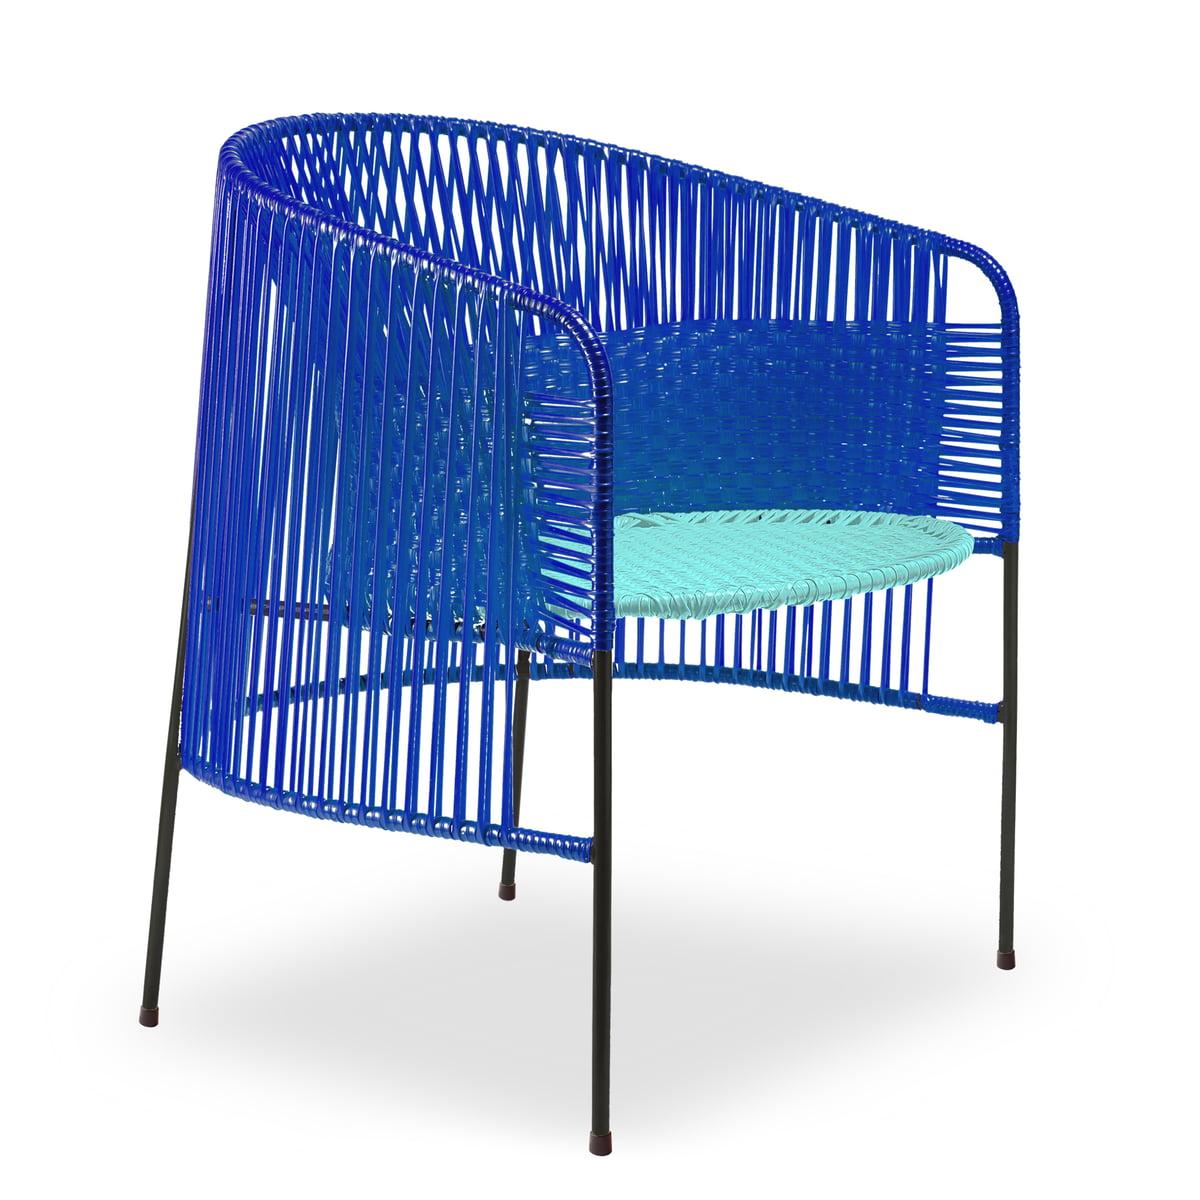 Material Christbaumkugeln.Ames Caribe Lounge Chair Schwarz Blau Braun